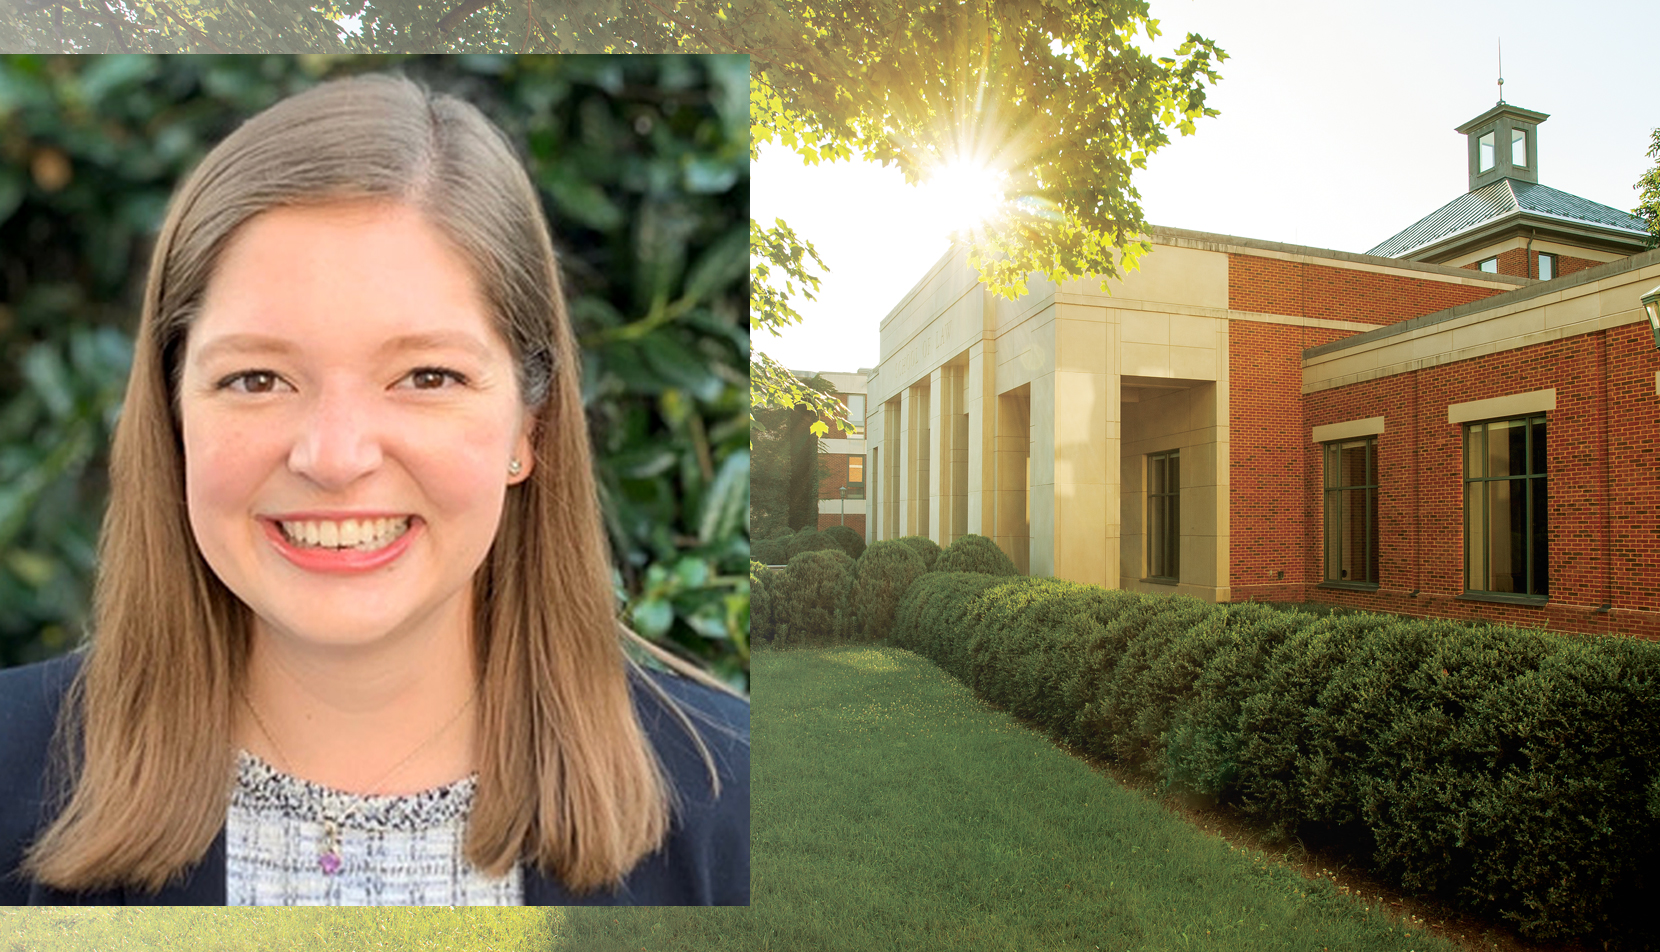 Mariette Peltier and UVA Law School